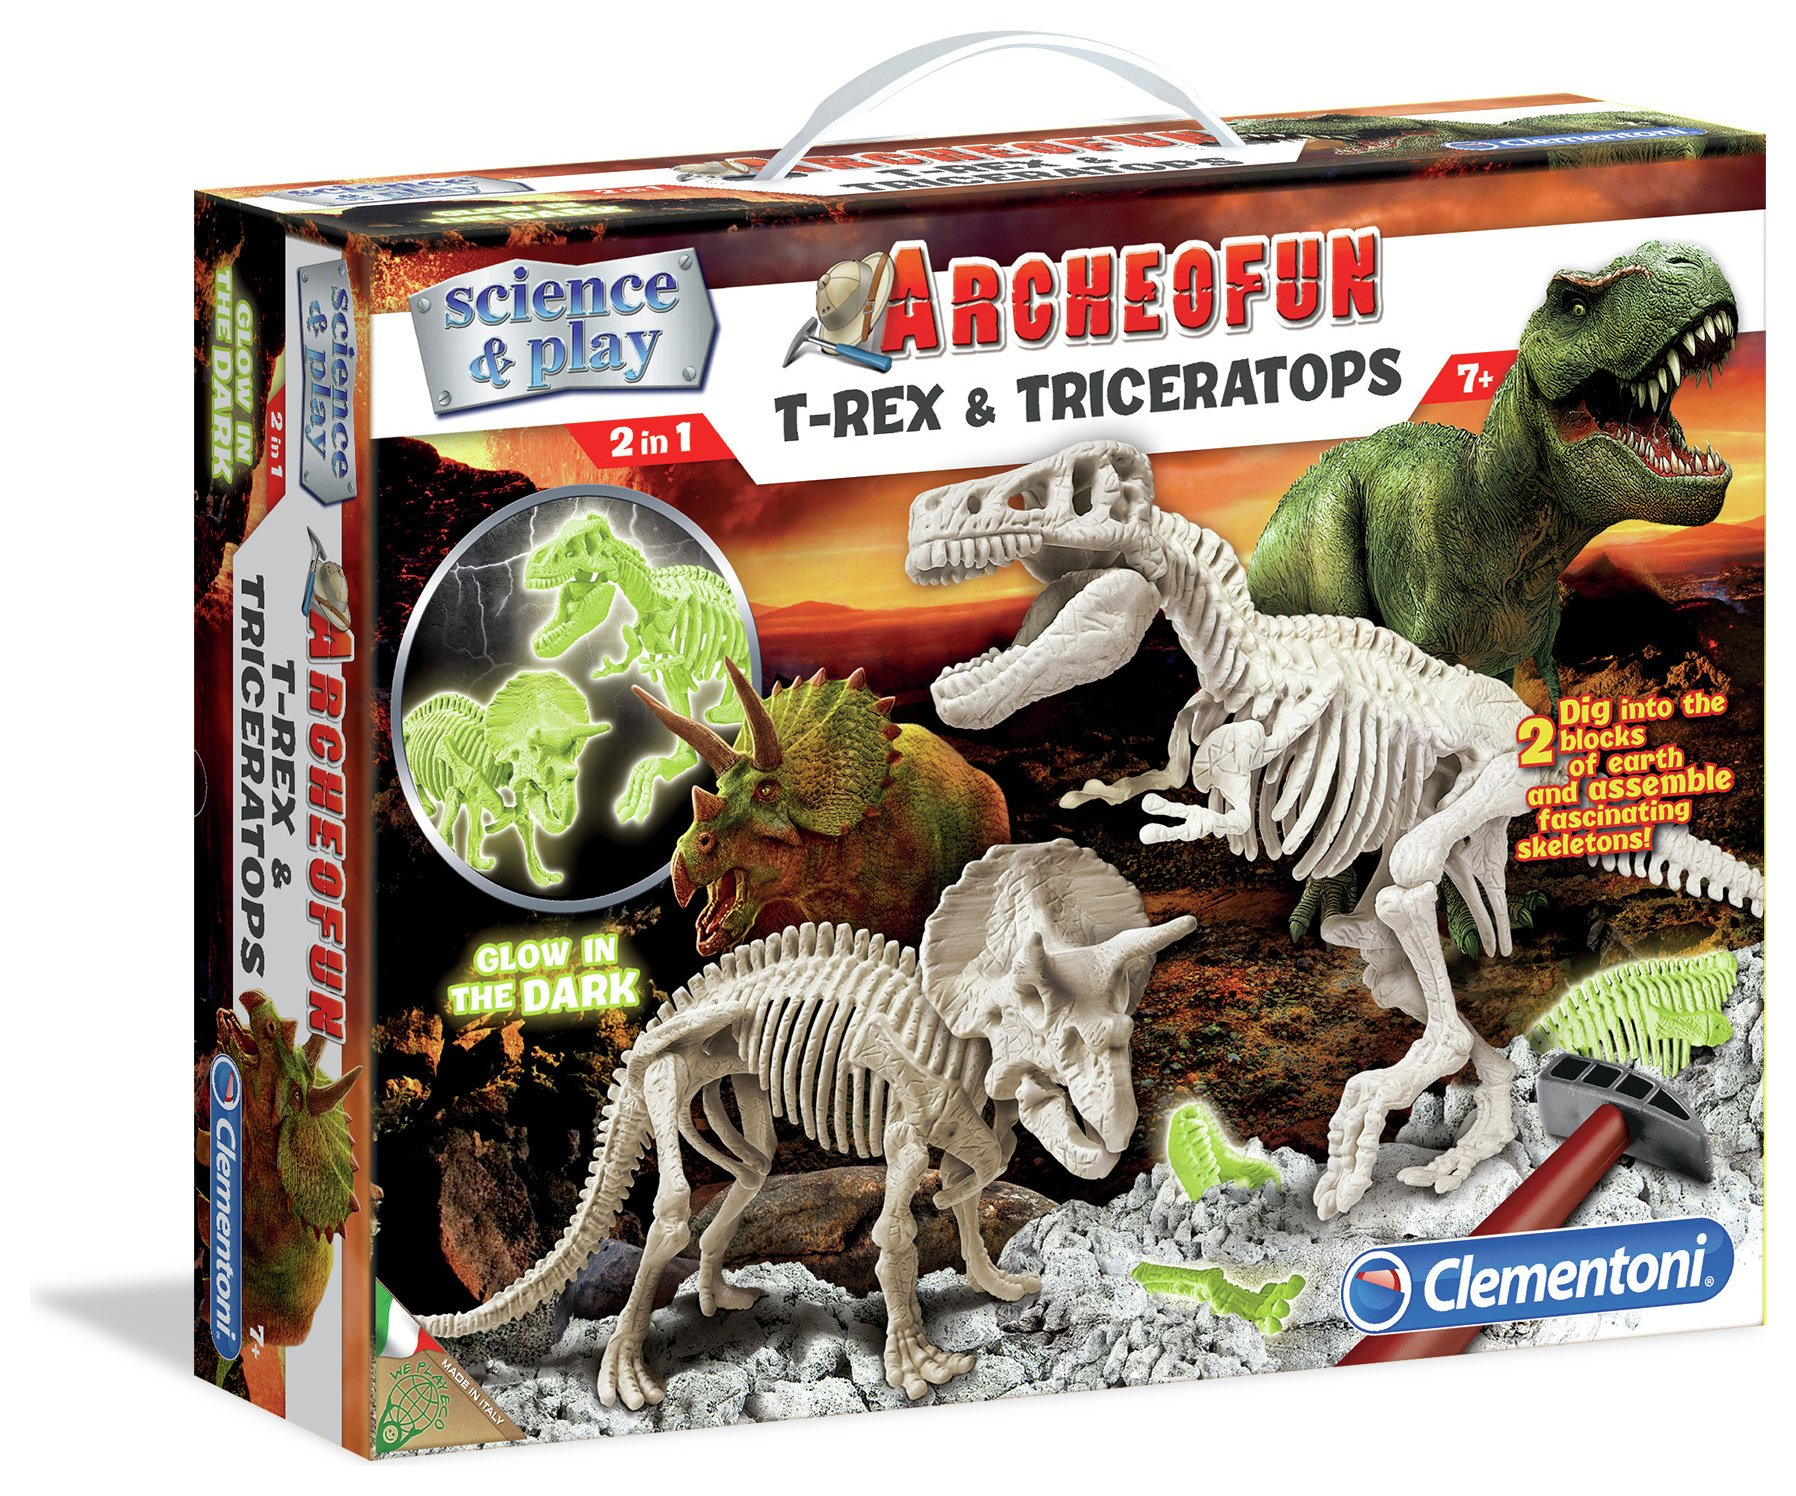 Image of Clementoni Archeofun - T-Rex & Triceratops Glow